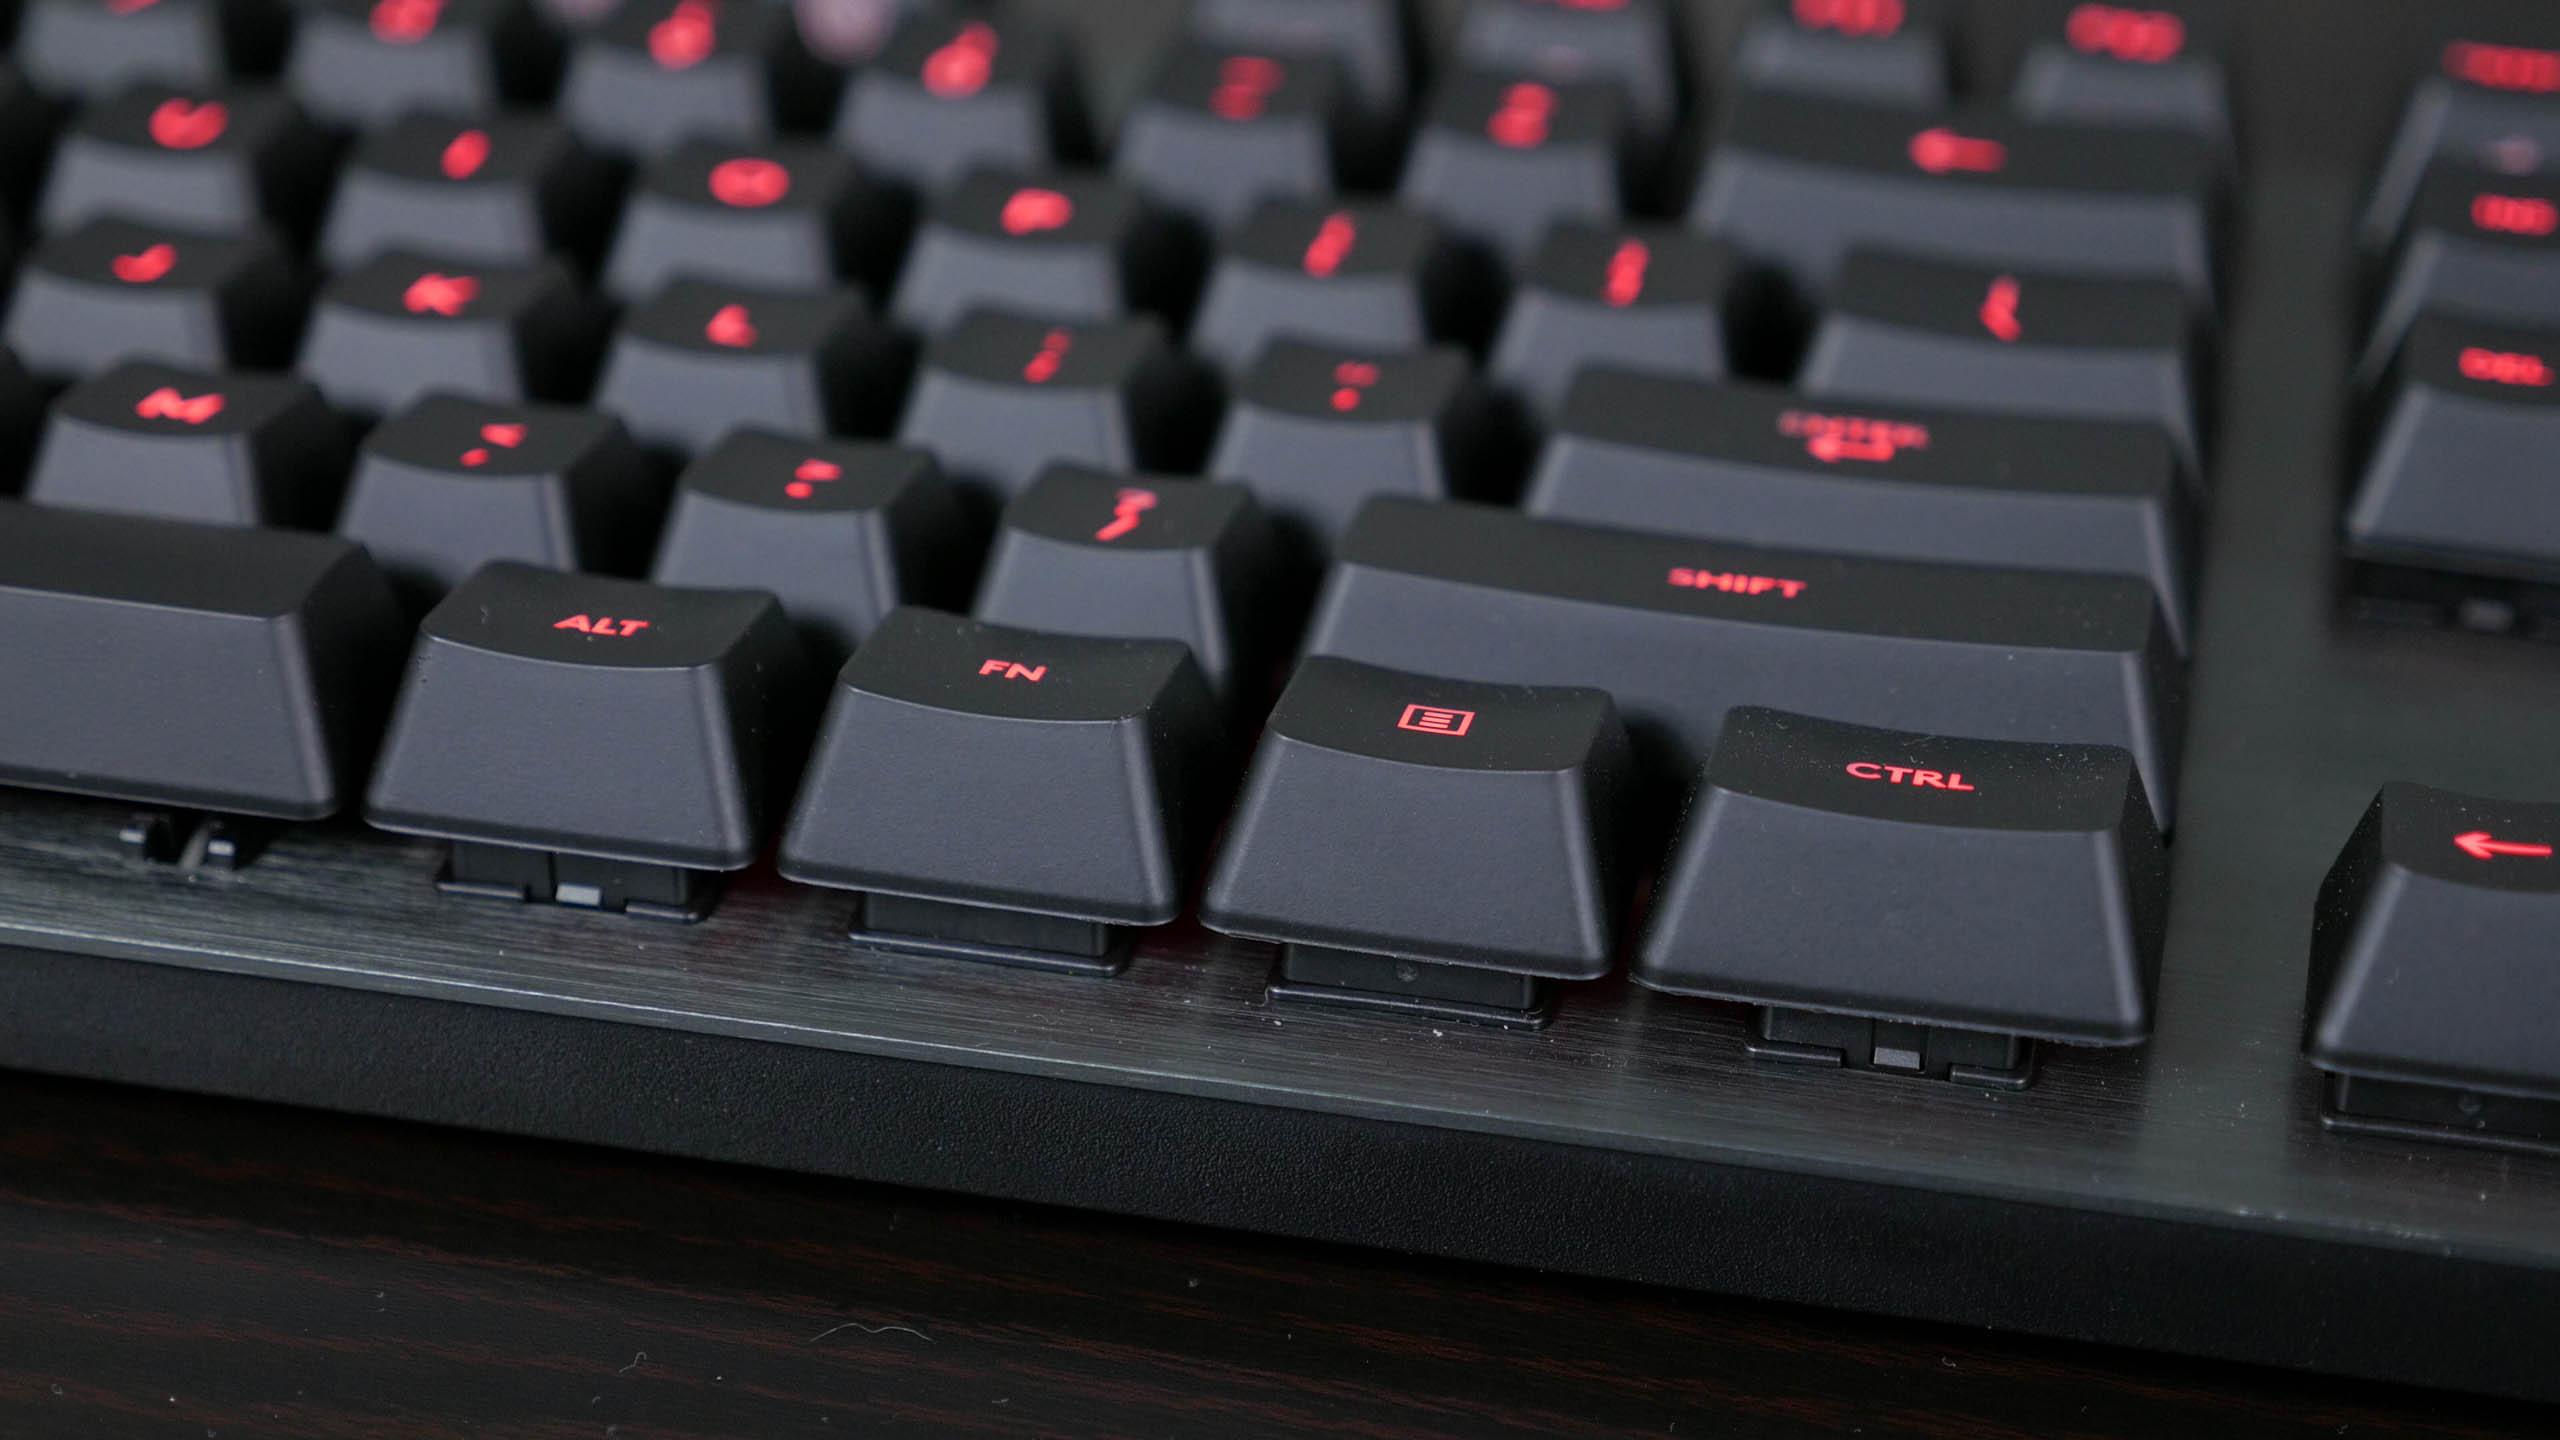 Logitech G413 Carbon Mechanical Keyboard Review Photo